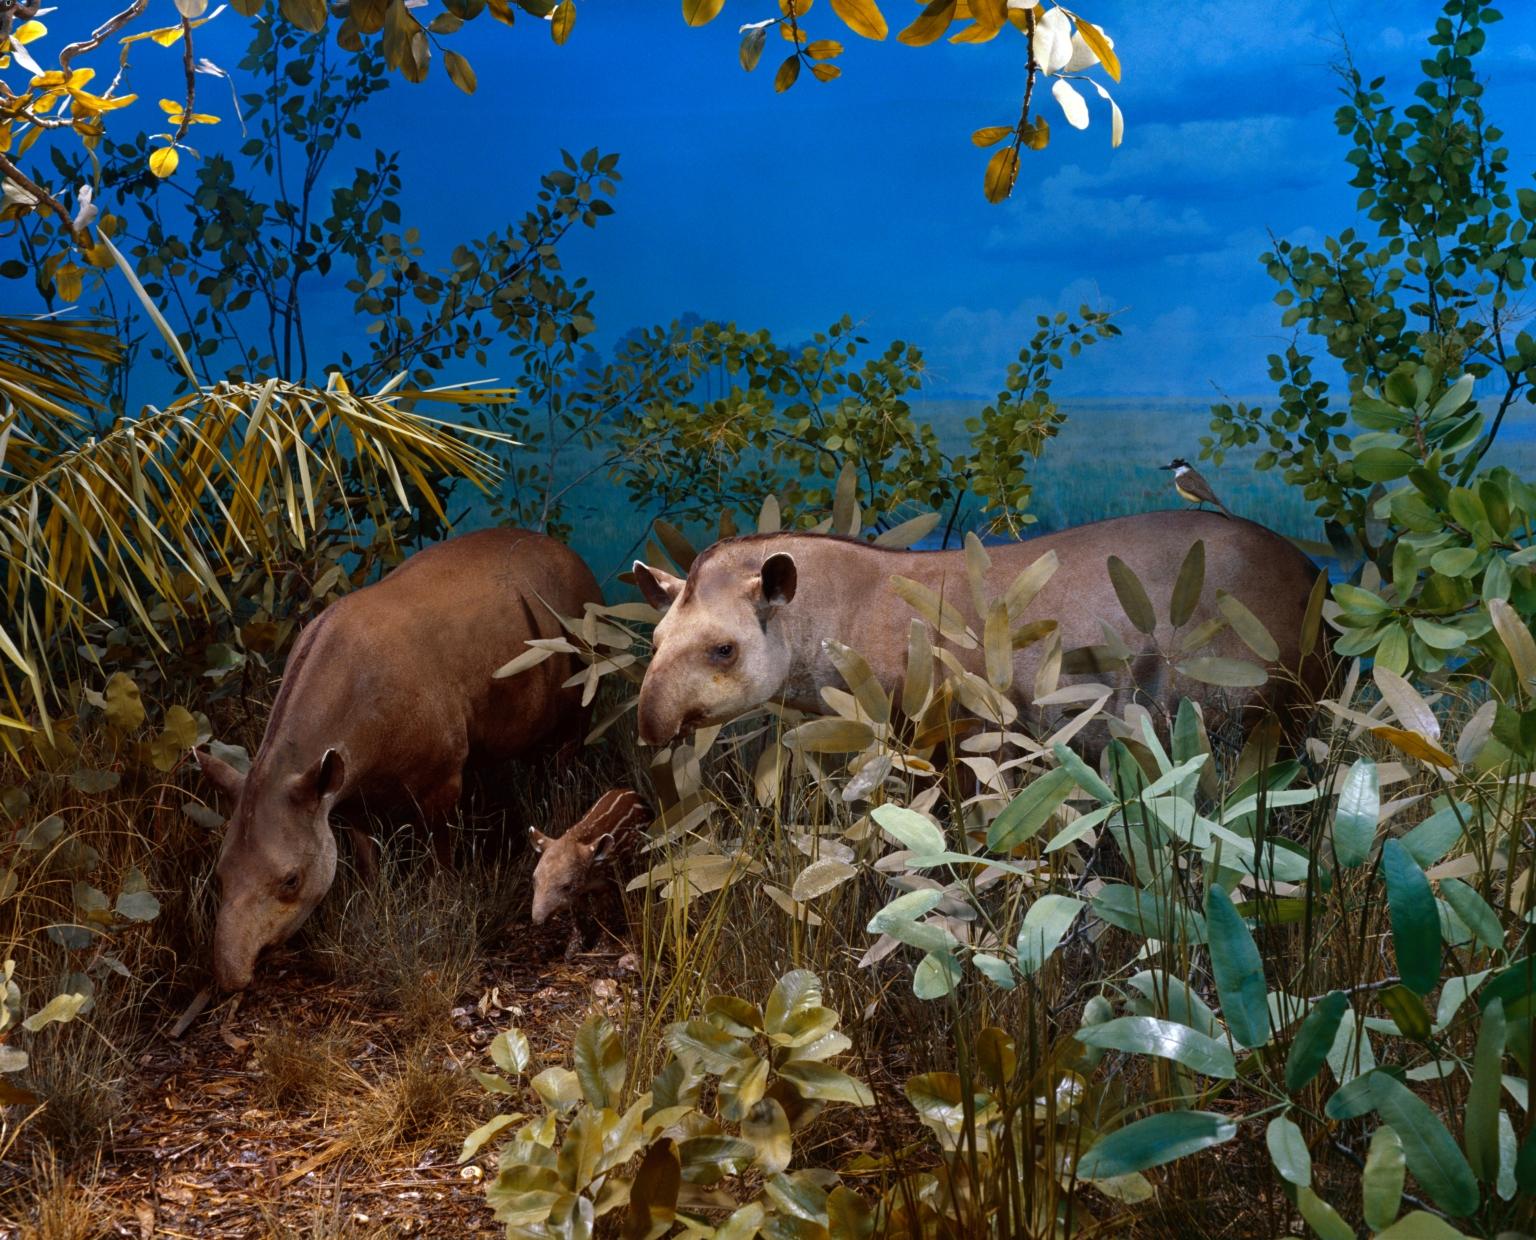 Tapirs in South American diorama